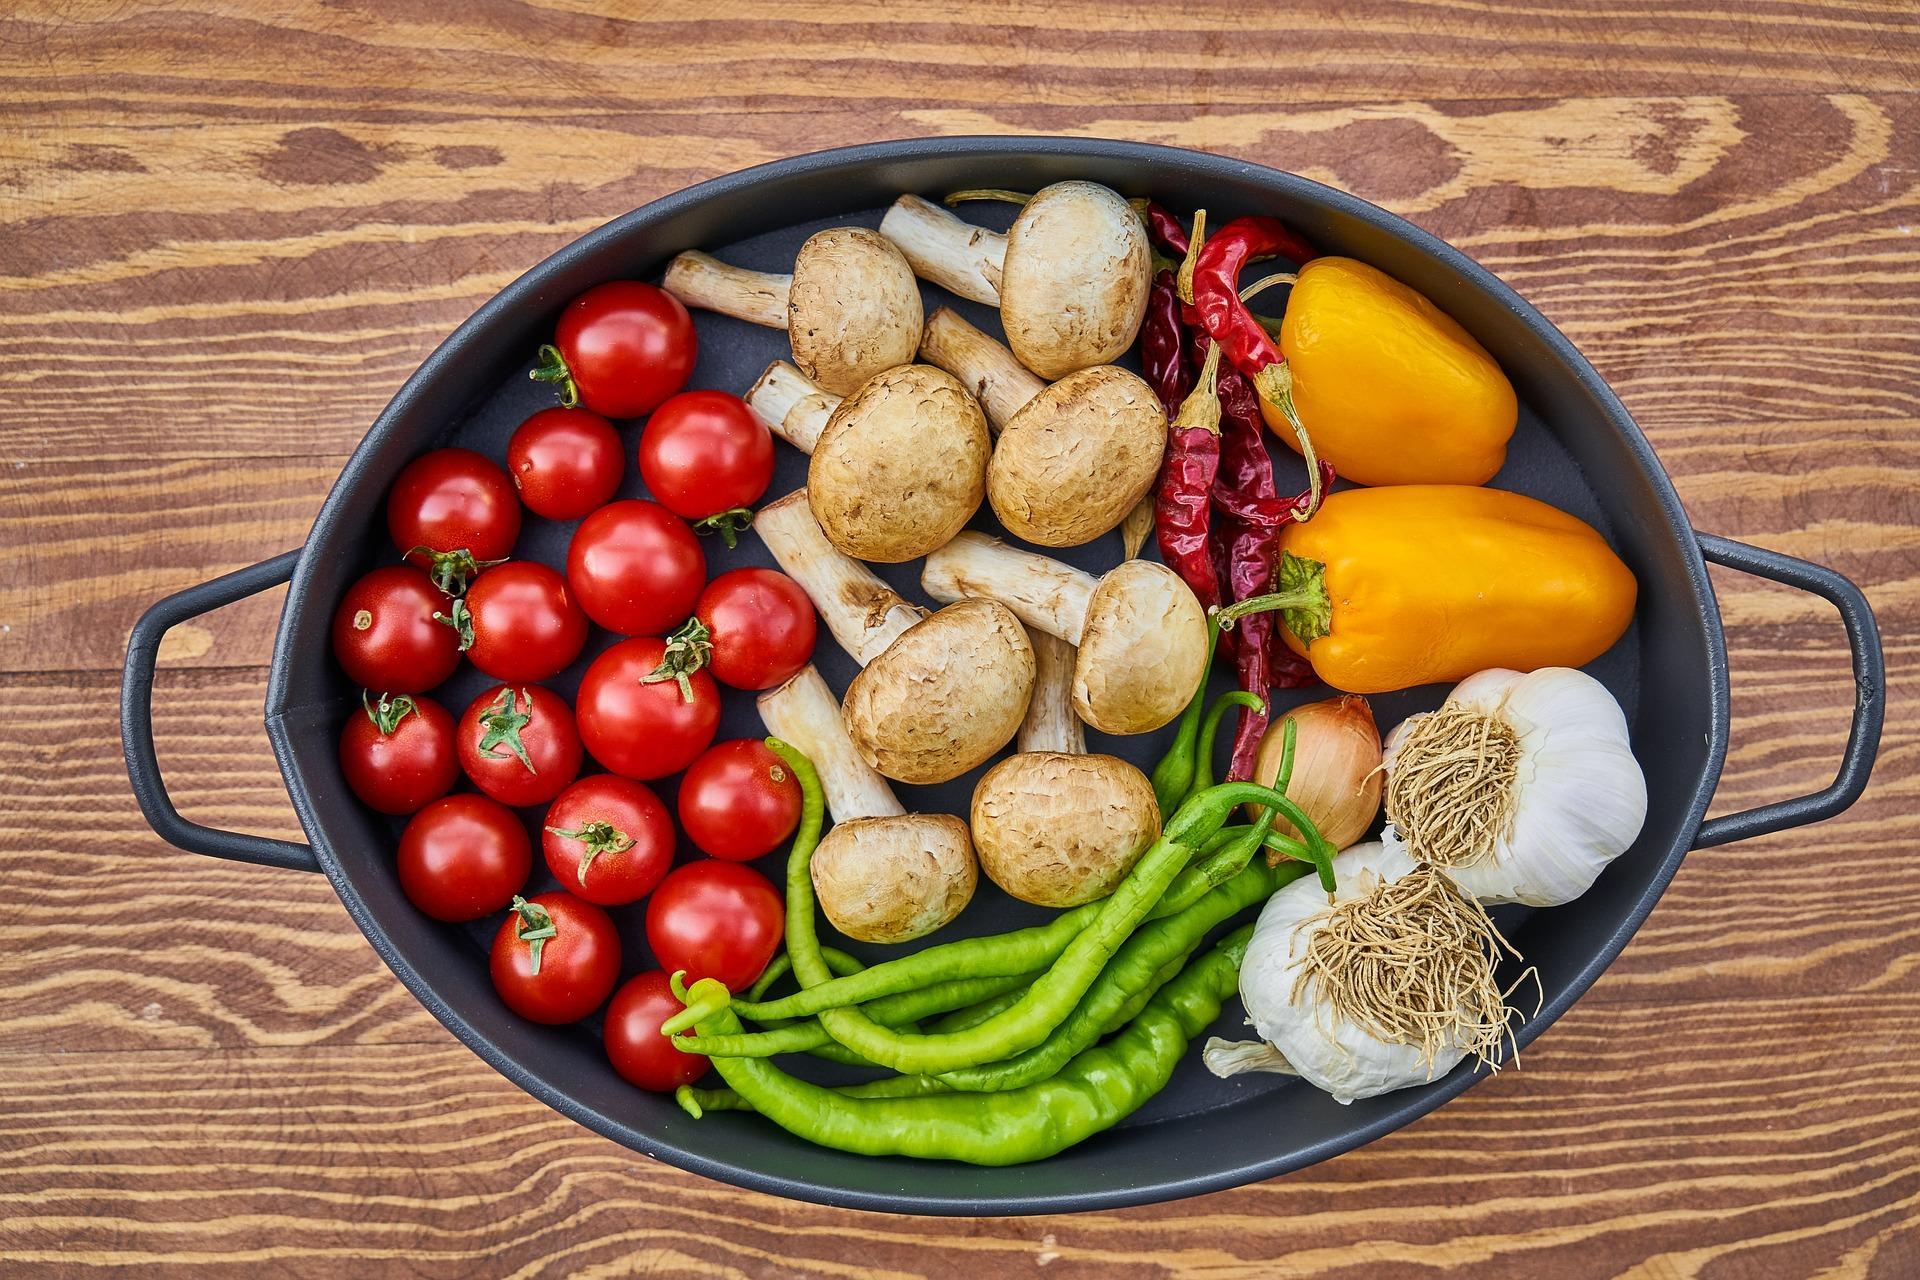 Gemüsekonzentrate statt Nitritpökelsalz?